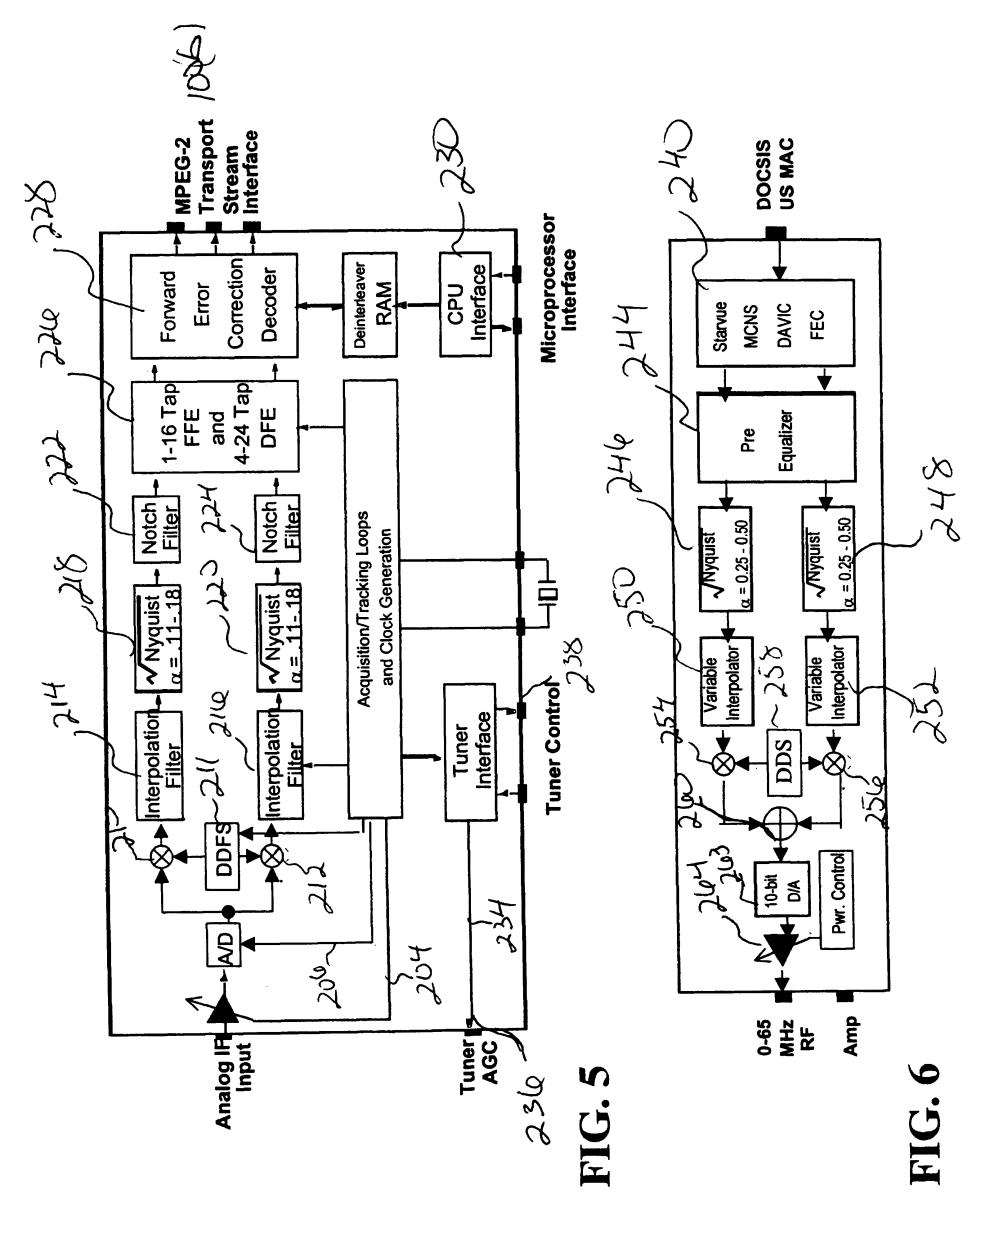 medium resolution of blazer trailer lights wiring diagram images acme transformer wiring diagrams single phase wiring